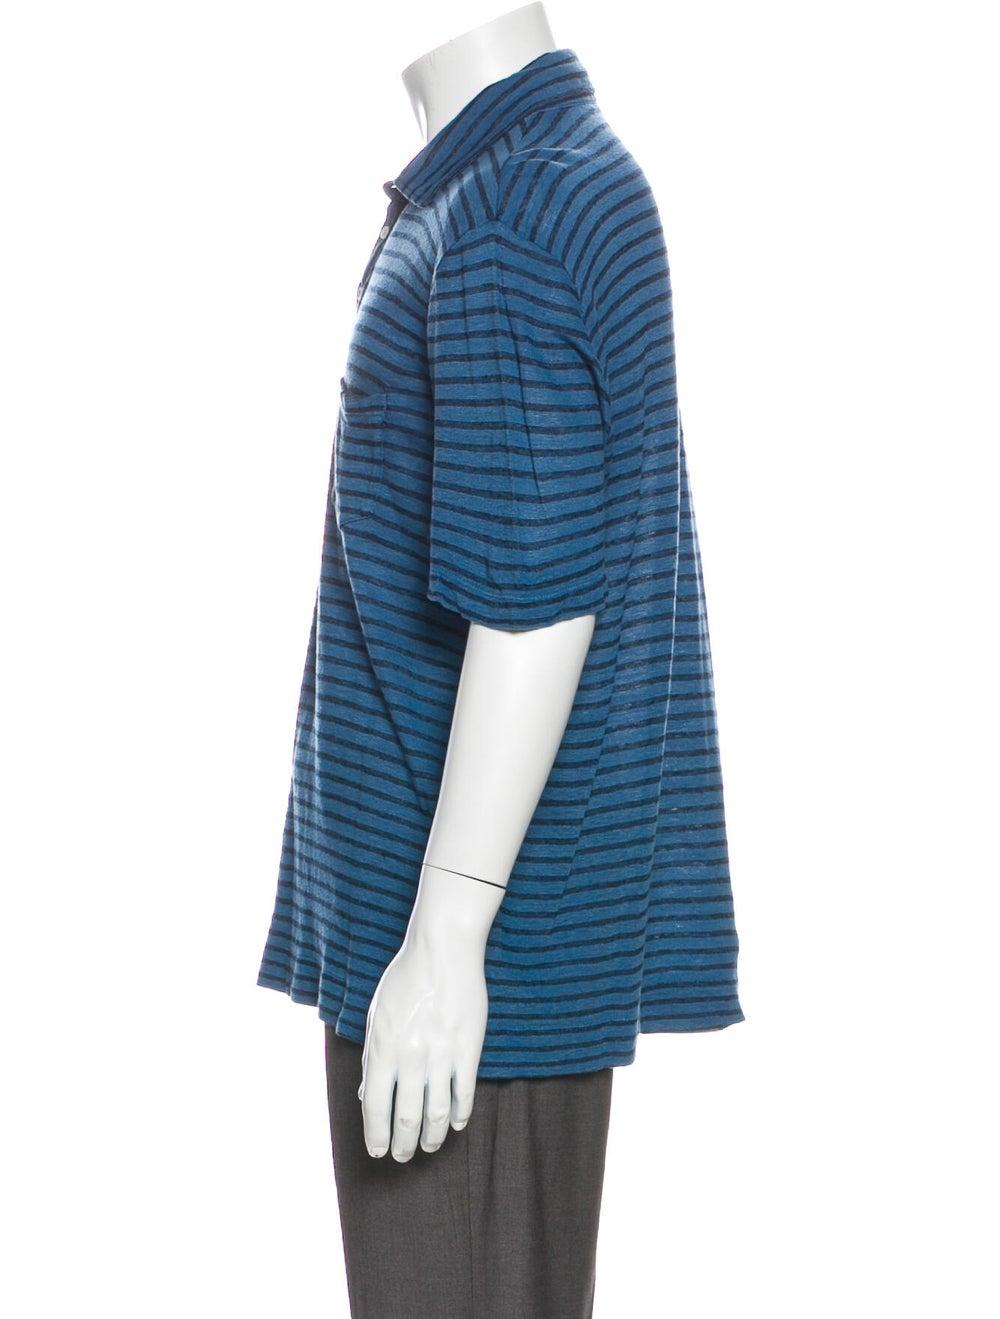 Massimo Alba Linen Striped Polo Shirt Blue - image 2